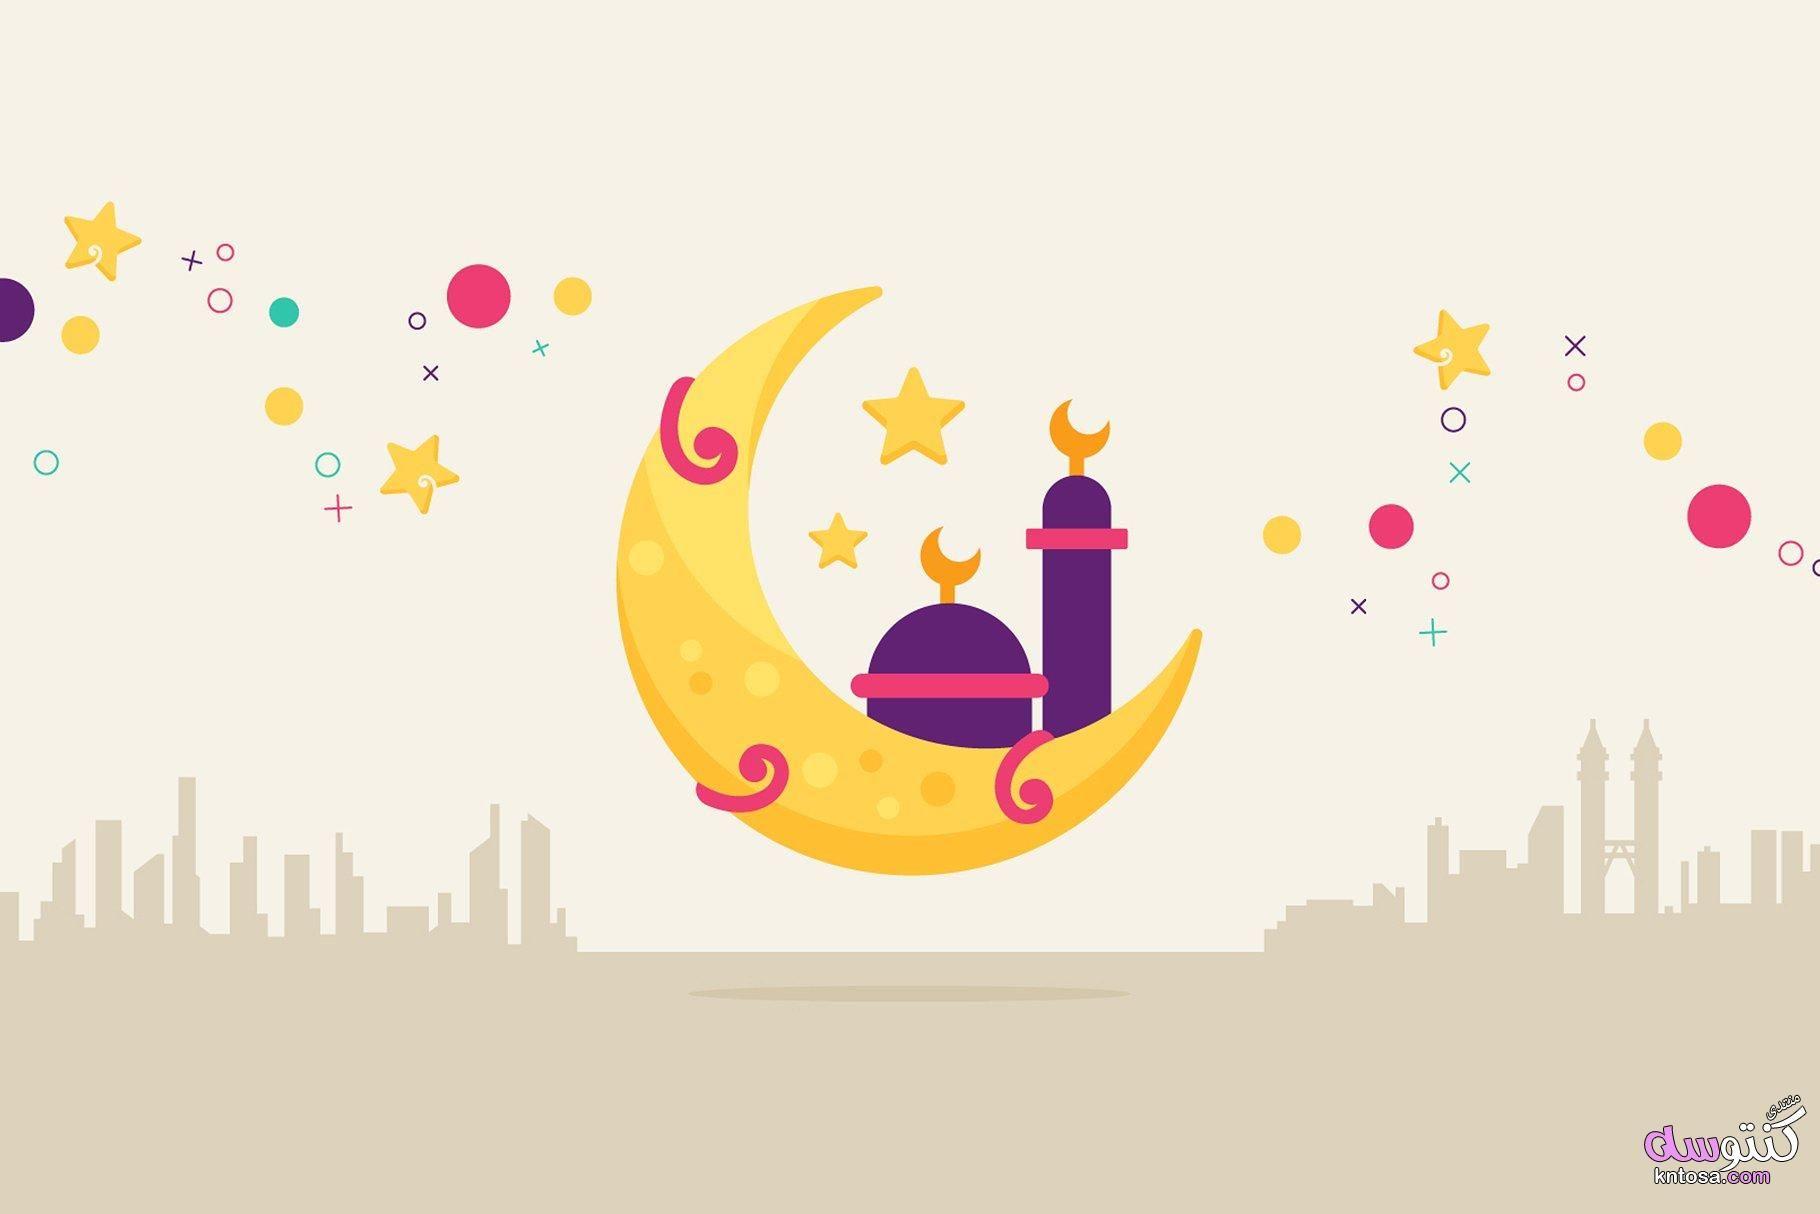 حقيبة رمضان للمصممين2019 رمضان كريم Png سكرابز رمضان Png ايقونات رمضان مبارك Kntosa Com 28 19 155 Ramadan Graphic Illustration Photoshop Illustrator